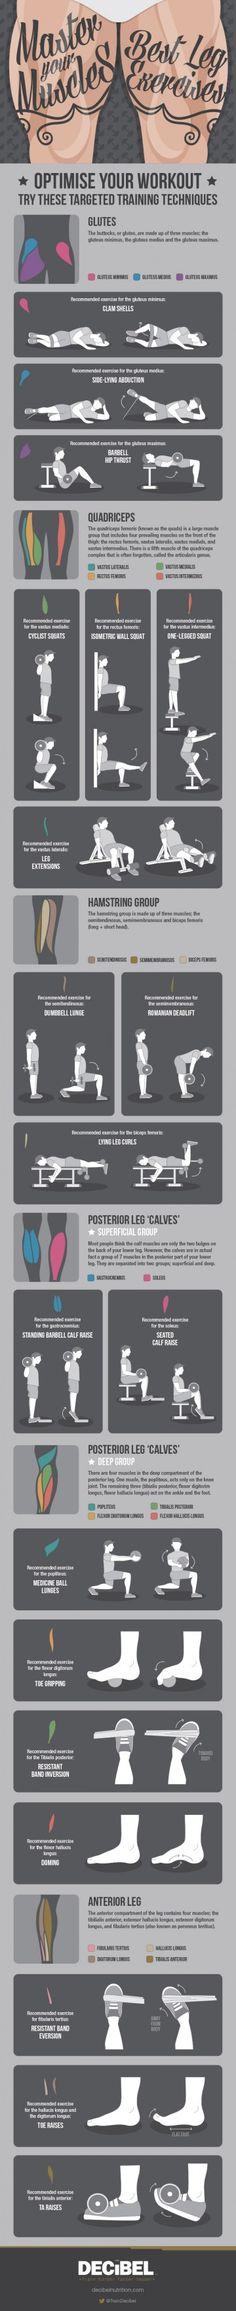 Best Leg Exercises Infographic